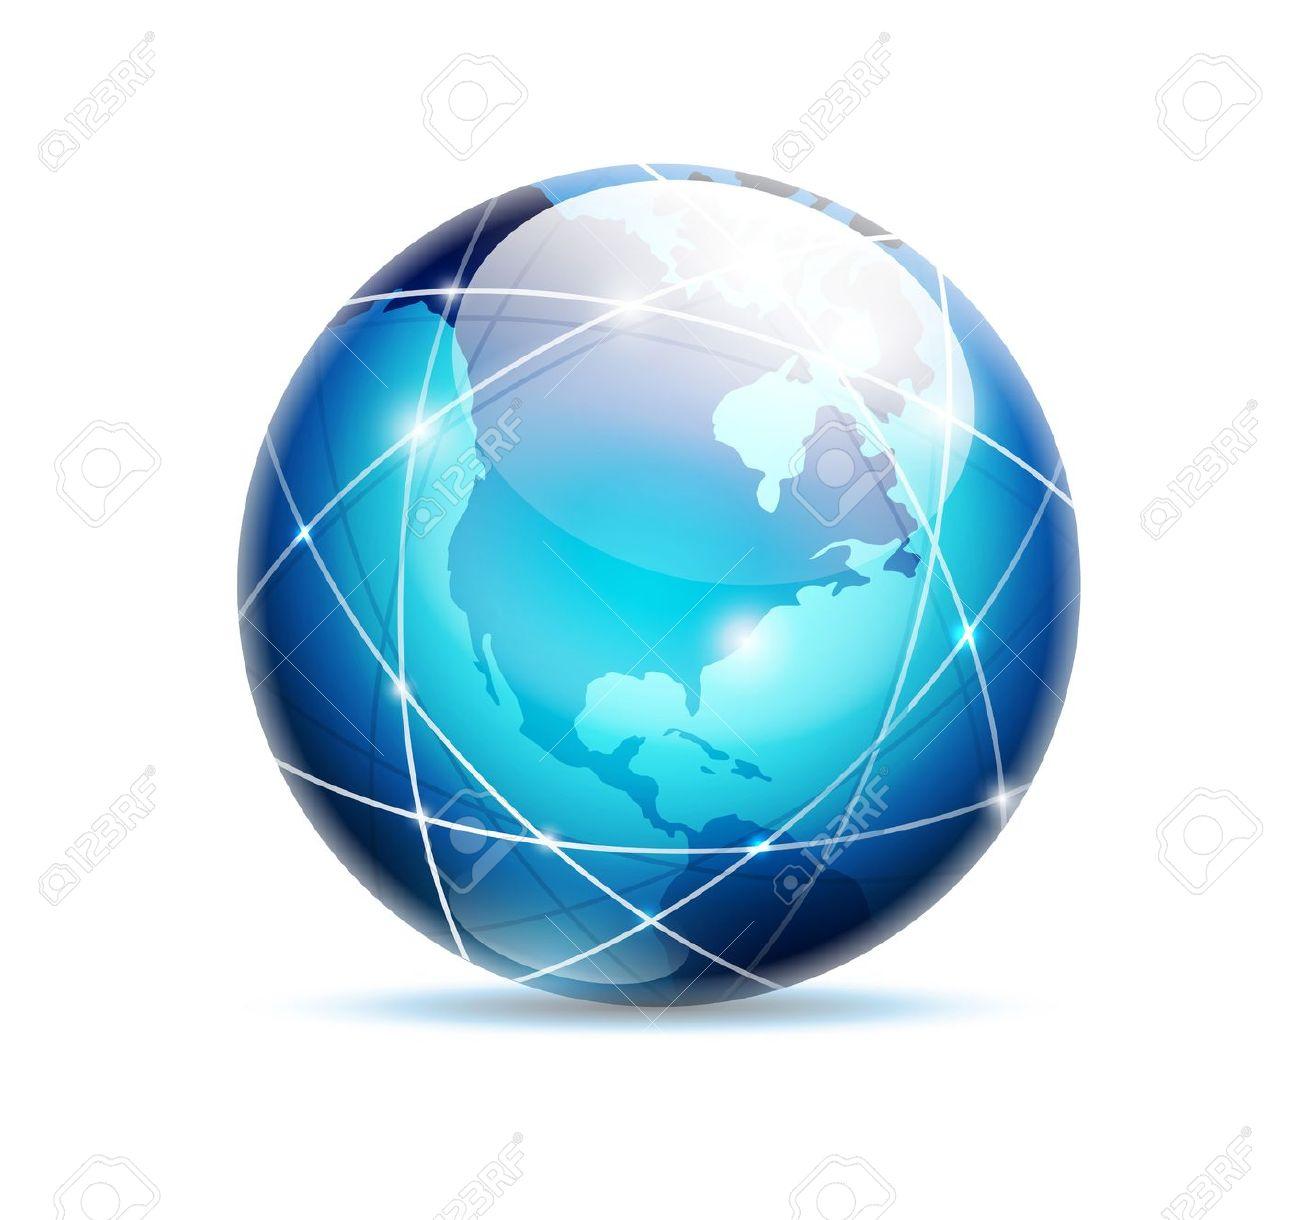 United states map globe clipart clip art download Us map globe clipart - ClipartFox clip art download